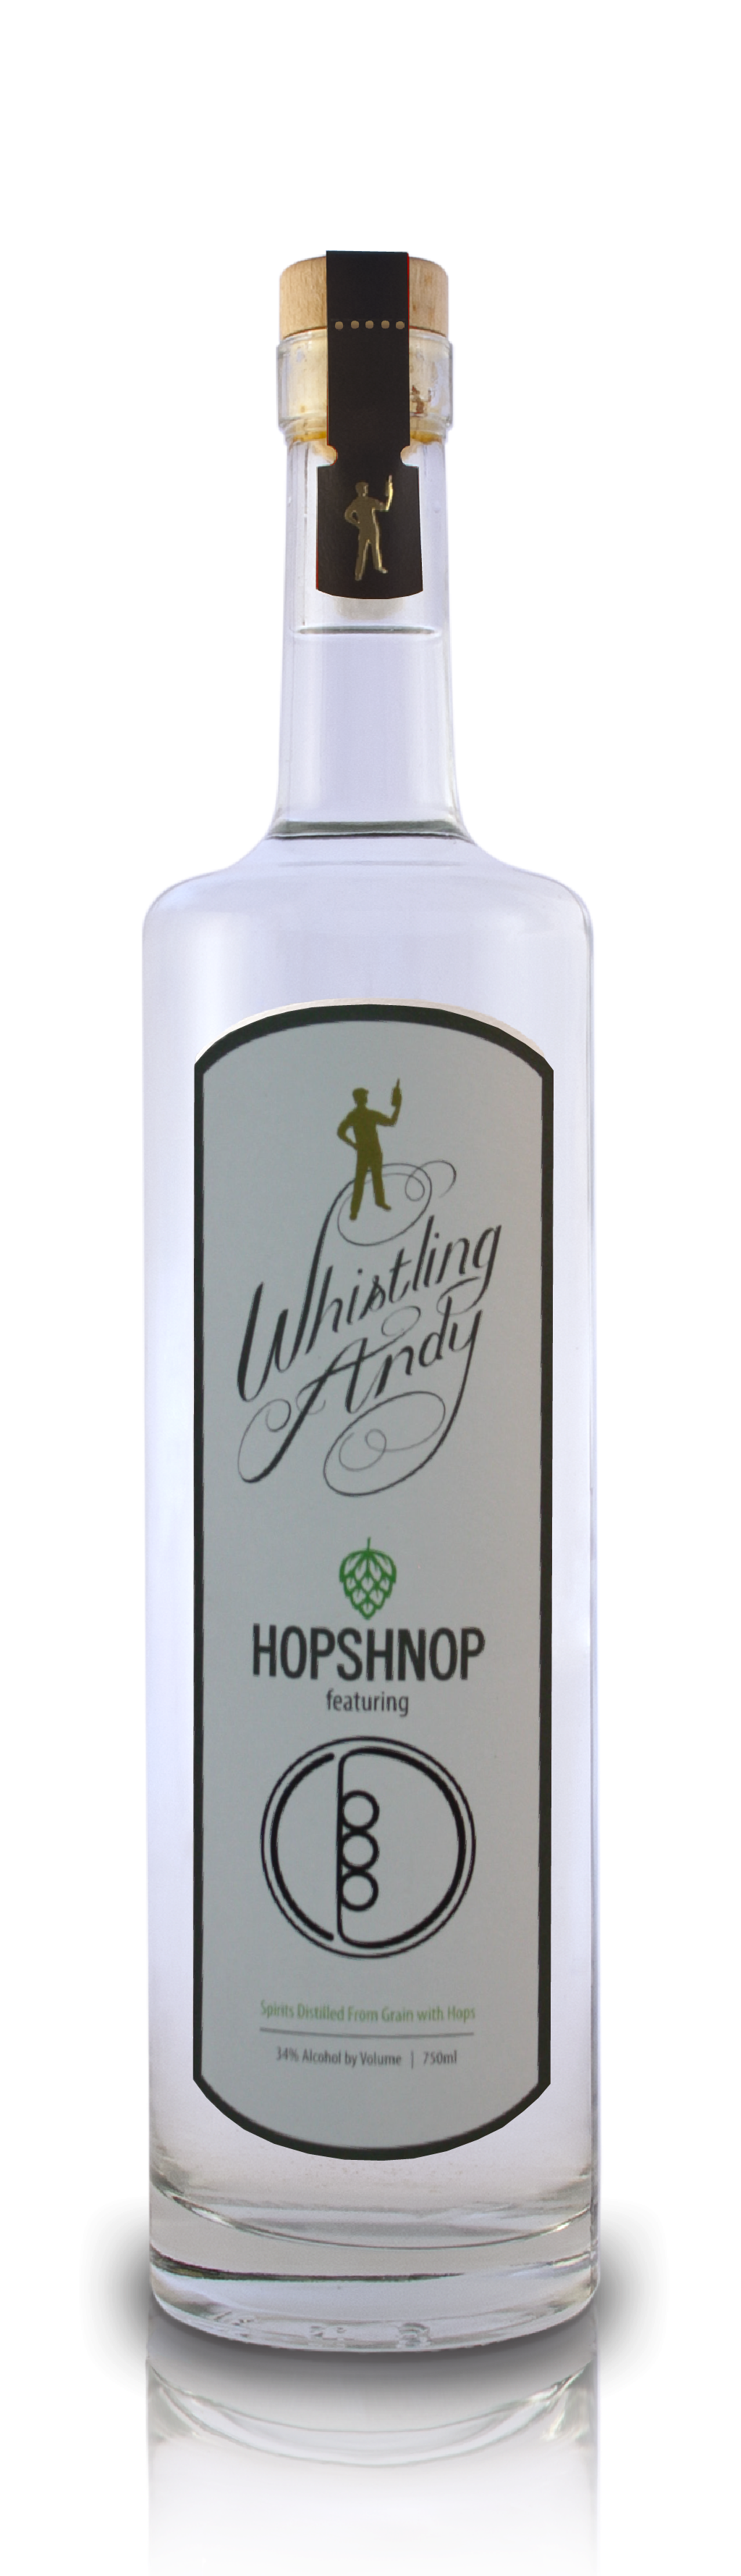 Hopshnop new-01.png